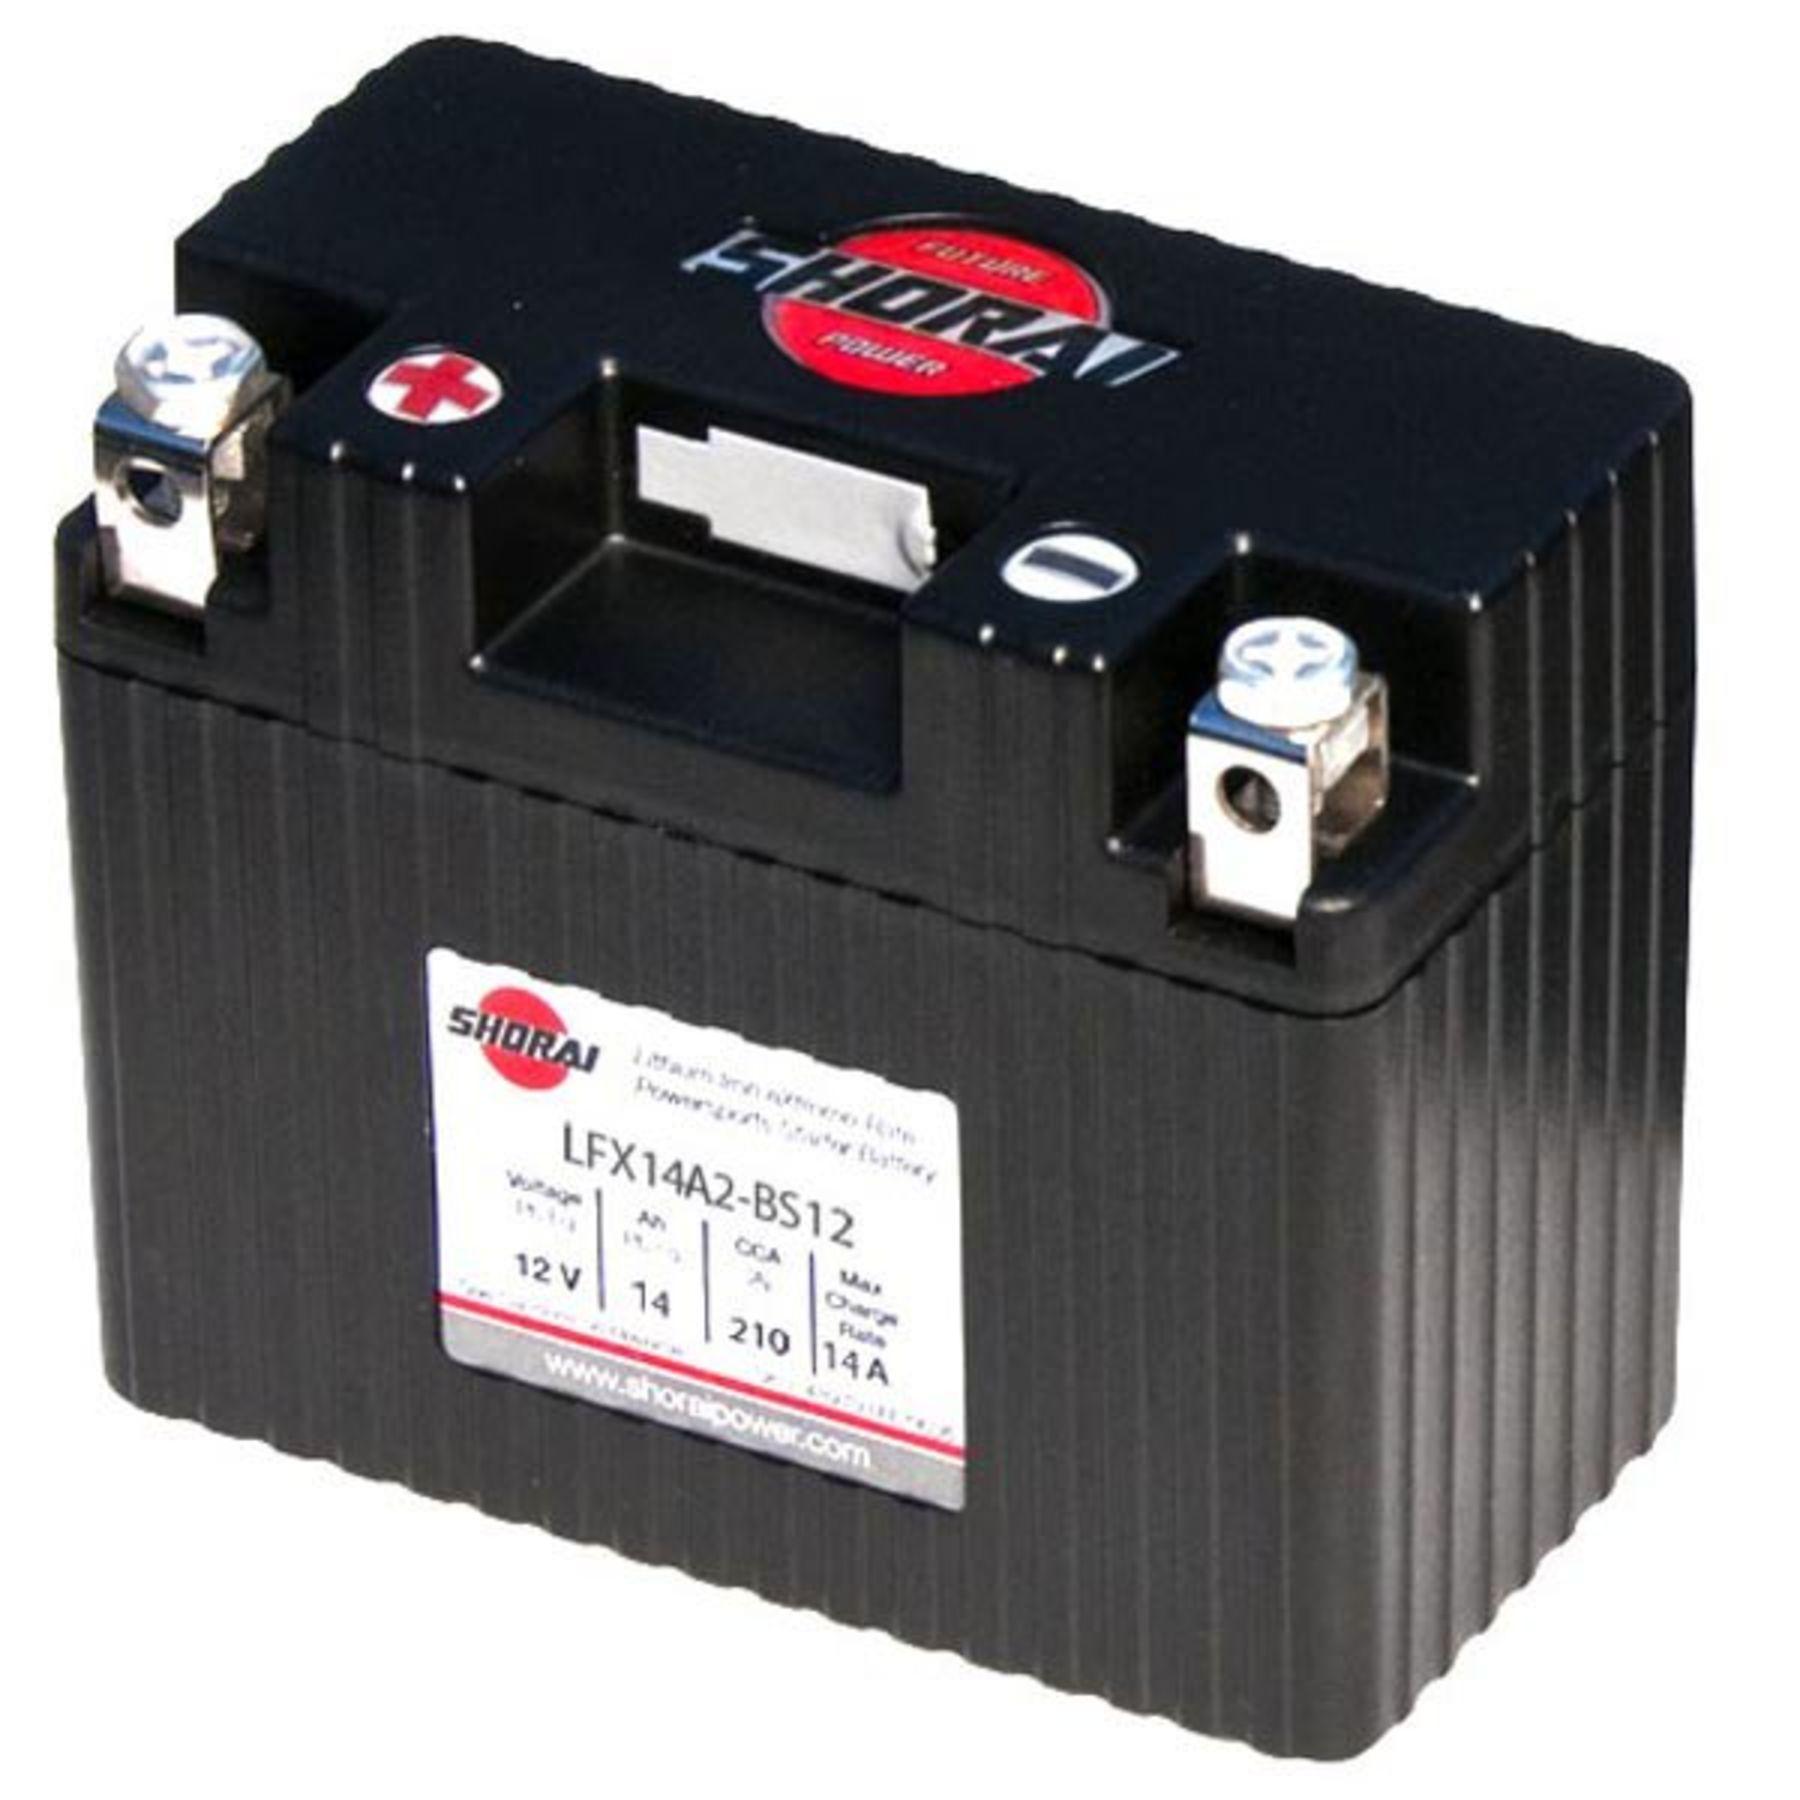 Lifepo4 Battery 14ah 12v Lithium Motorcycle Atv Batteries Lfx Engine Wiring Harness Lfx14a2 Bs12